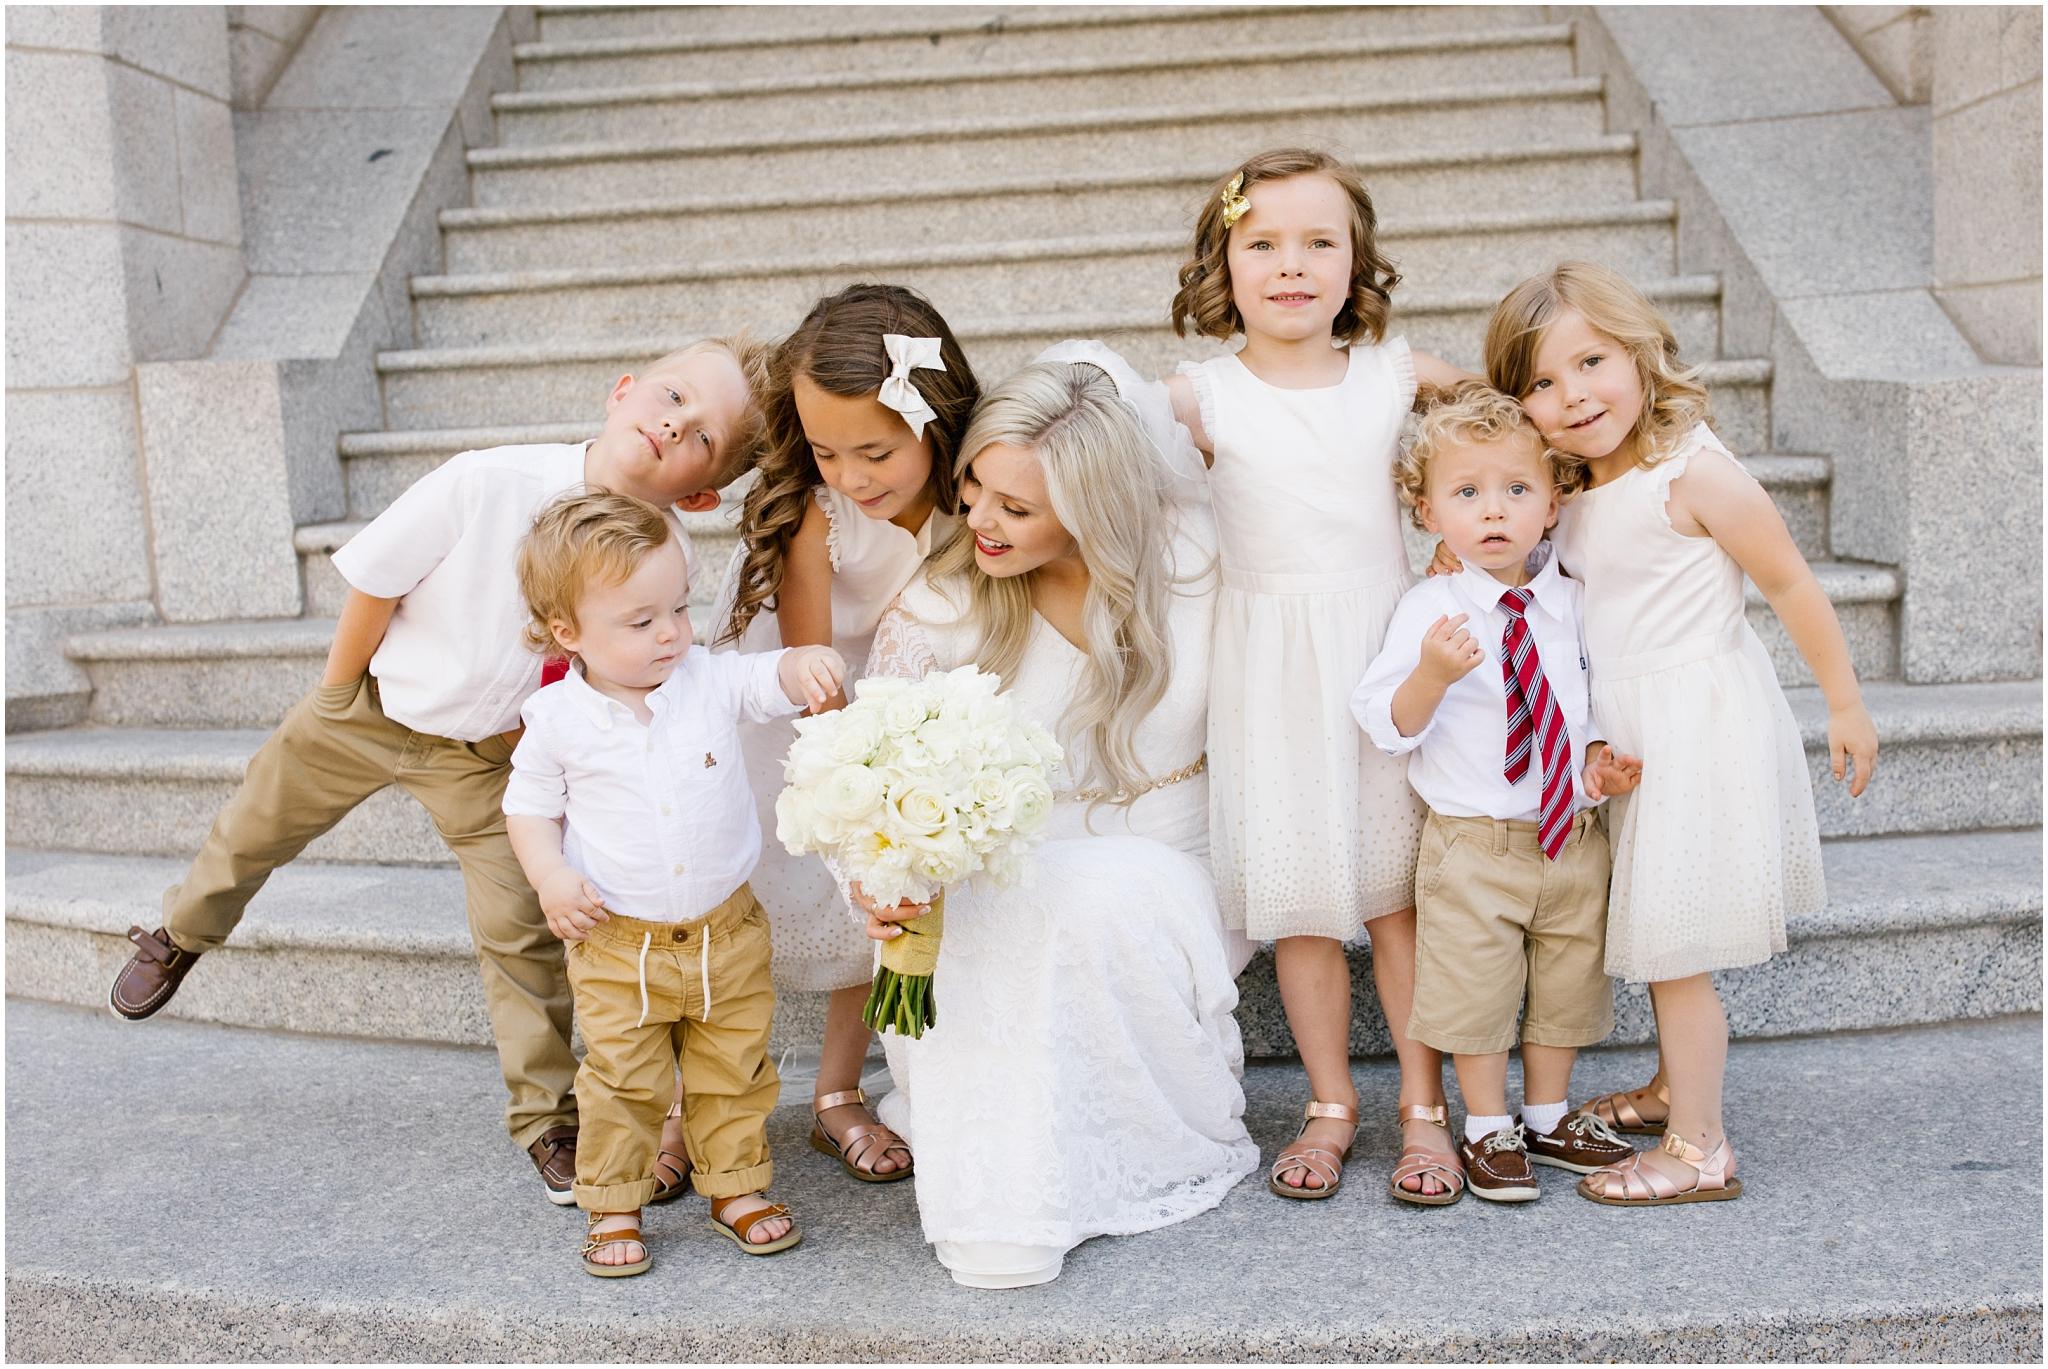 CherylandTyler-104_Lizzie-B-Imagery-Utah-Wedding-Photographer-Salt-Lake-City-Temple-Wells-Fargo-Building-Reception.jpg